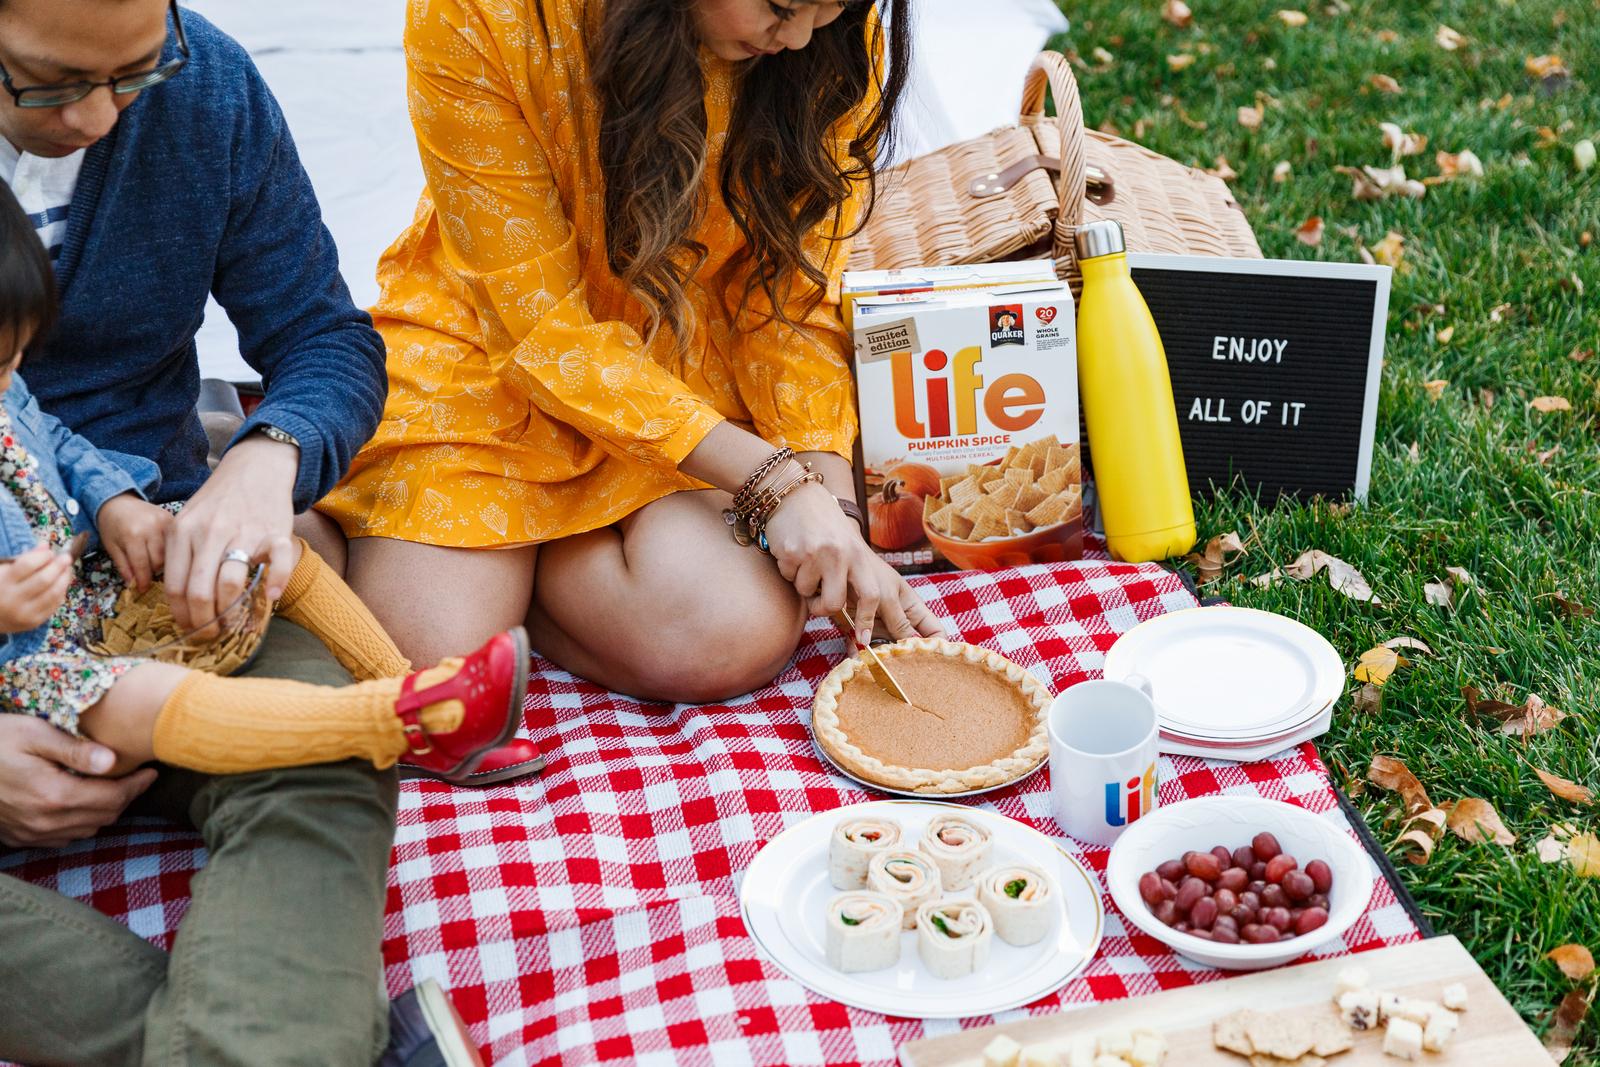 Pumpkin pie at a picnic